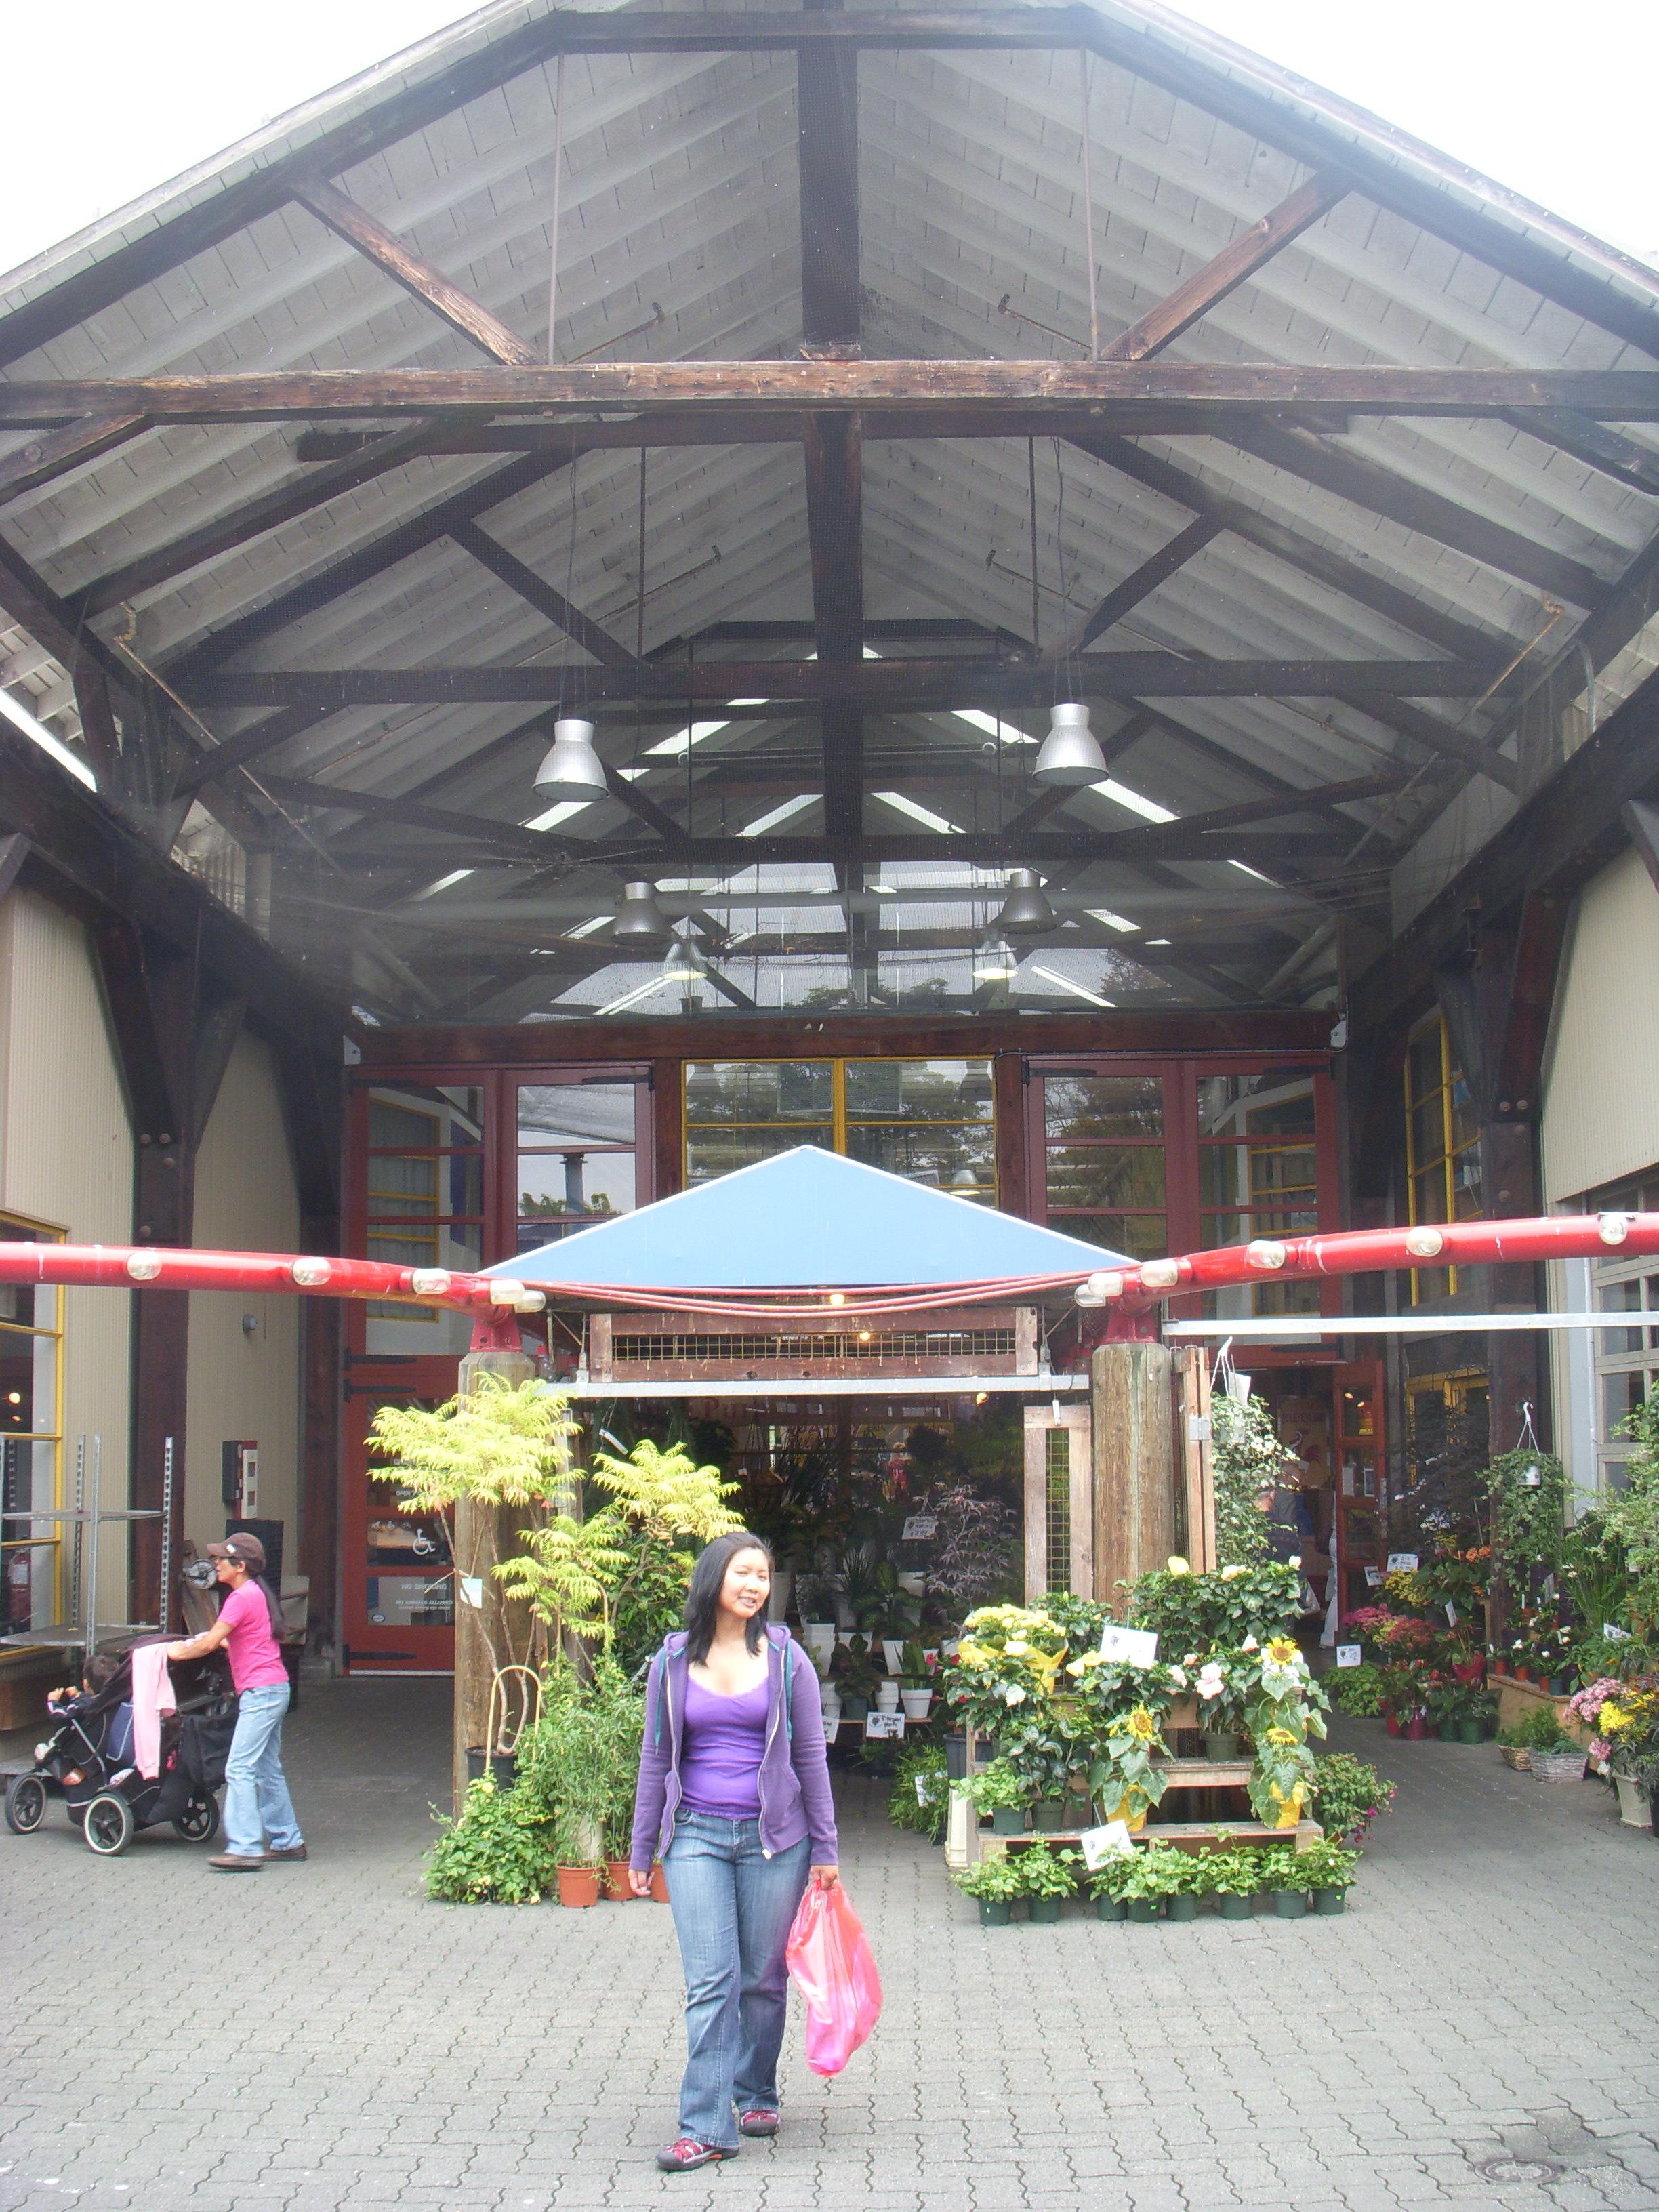 Mai at the entrance